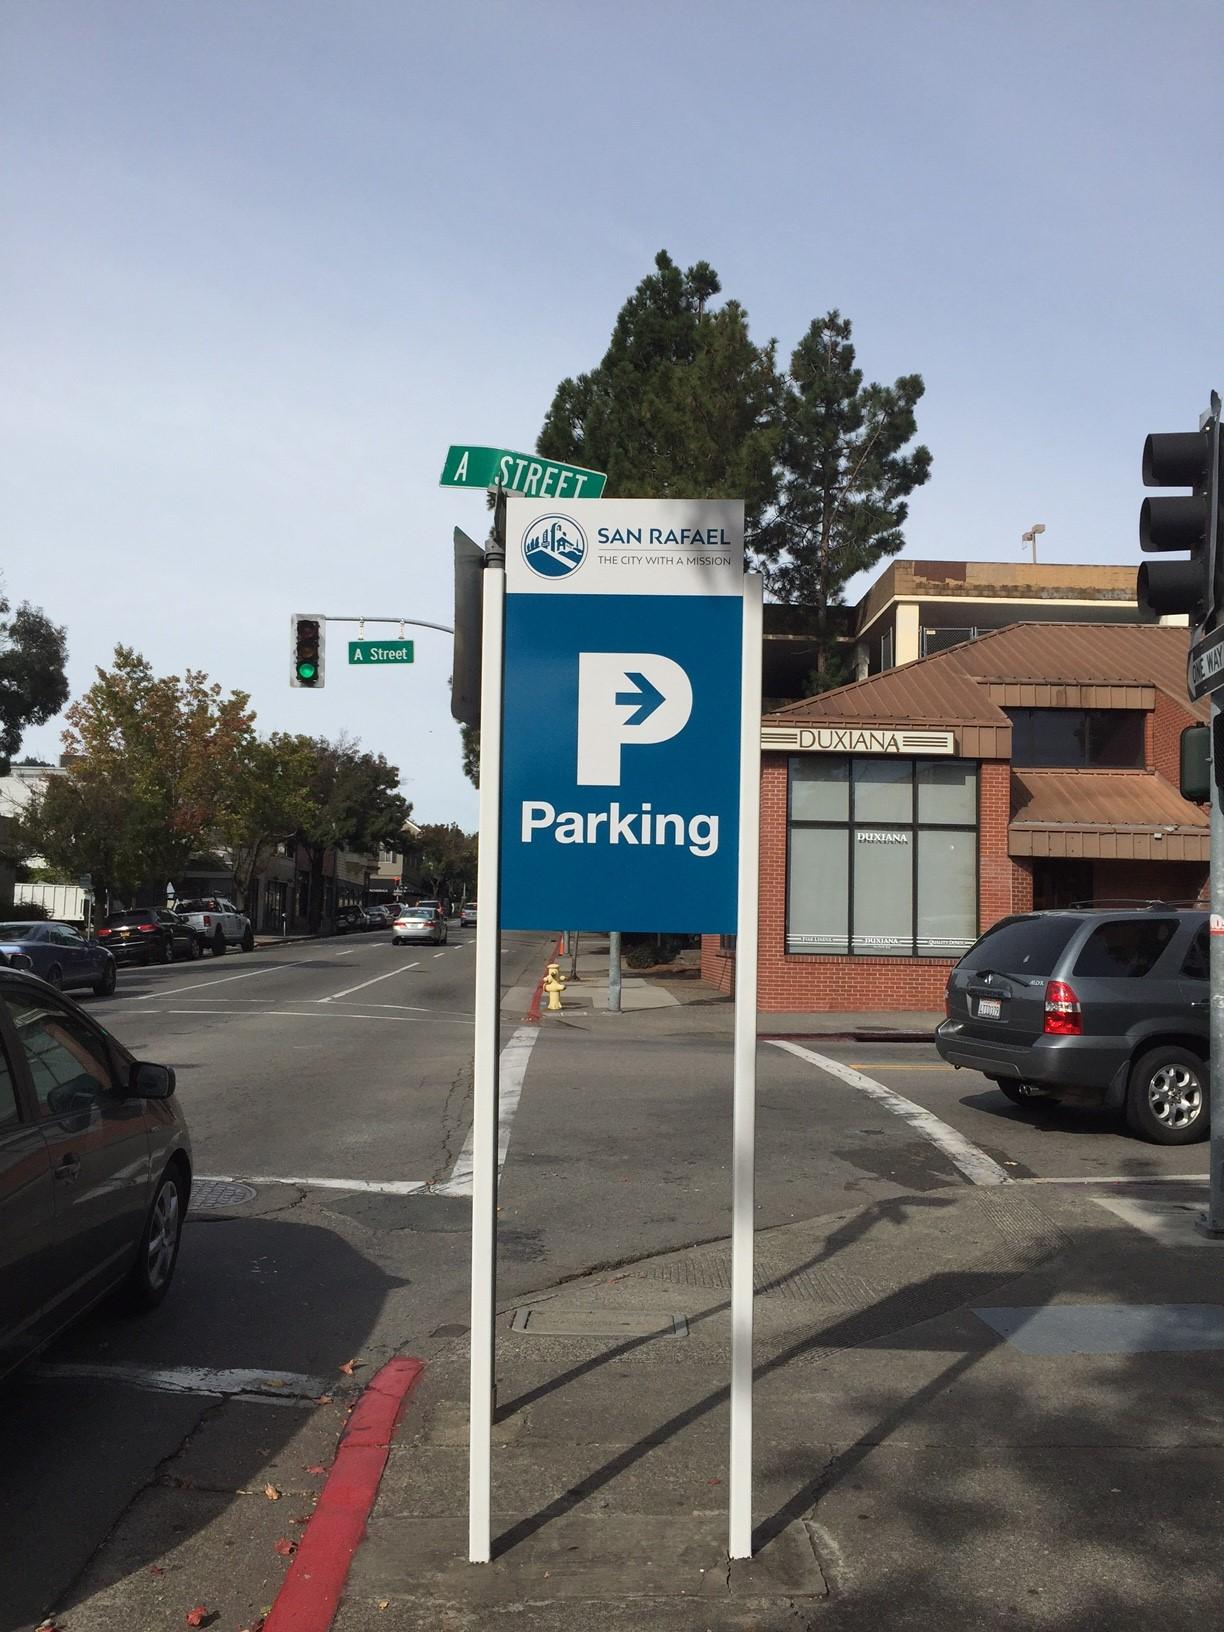 3rd_A street demo parking sign